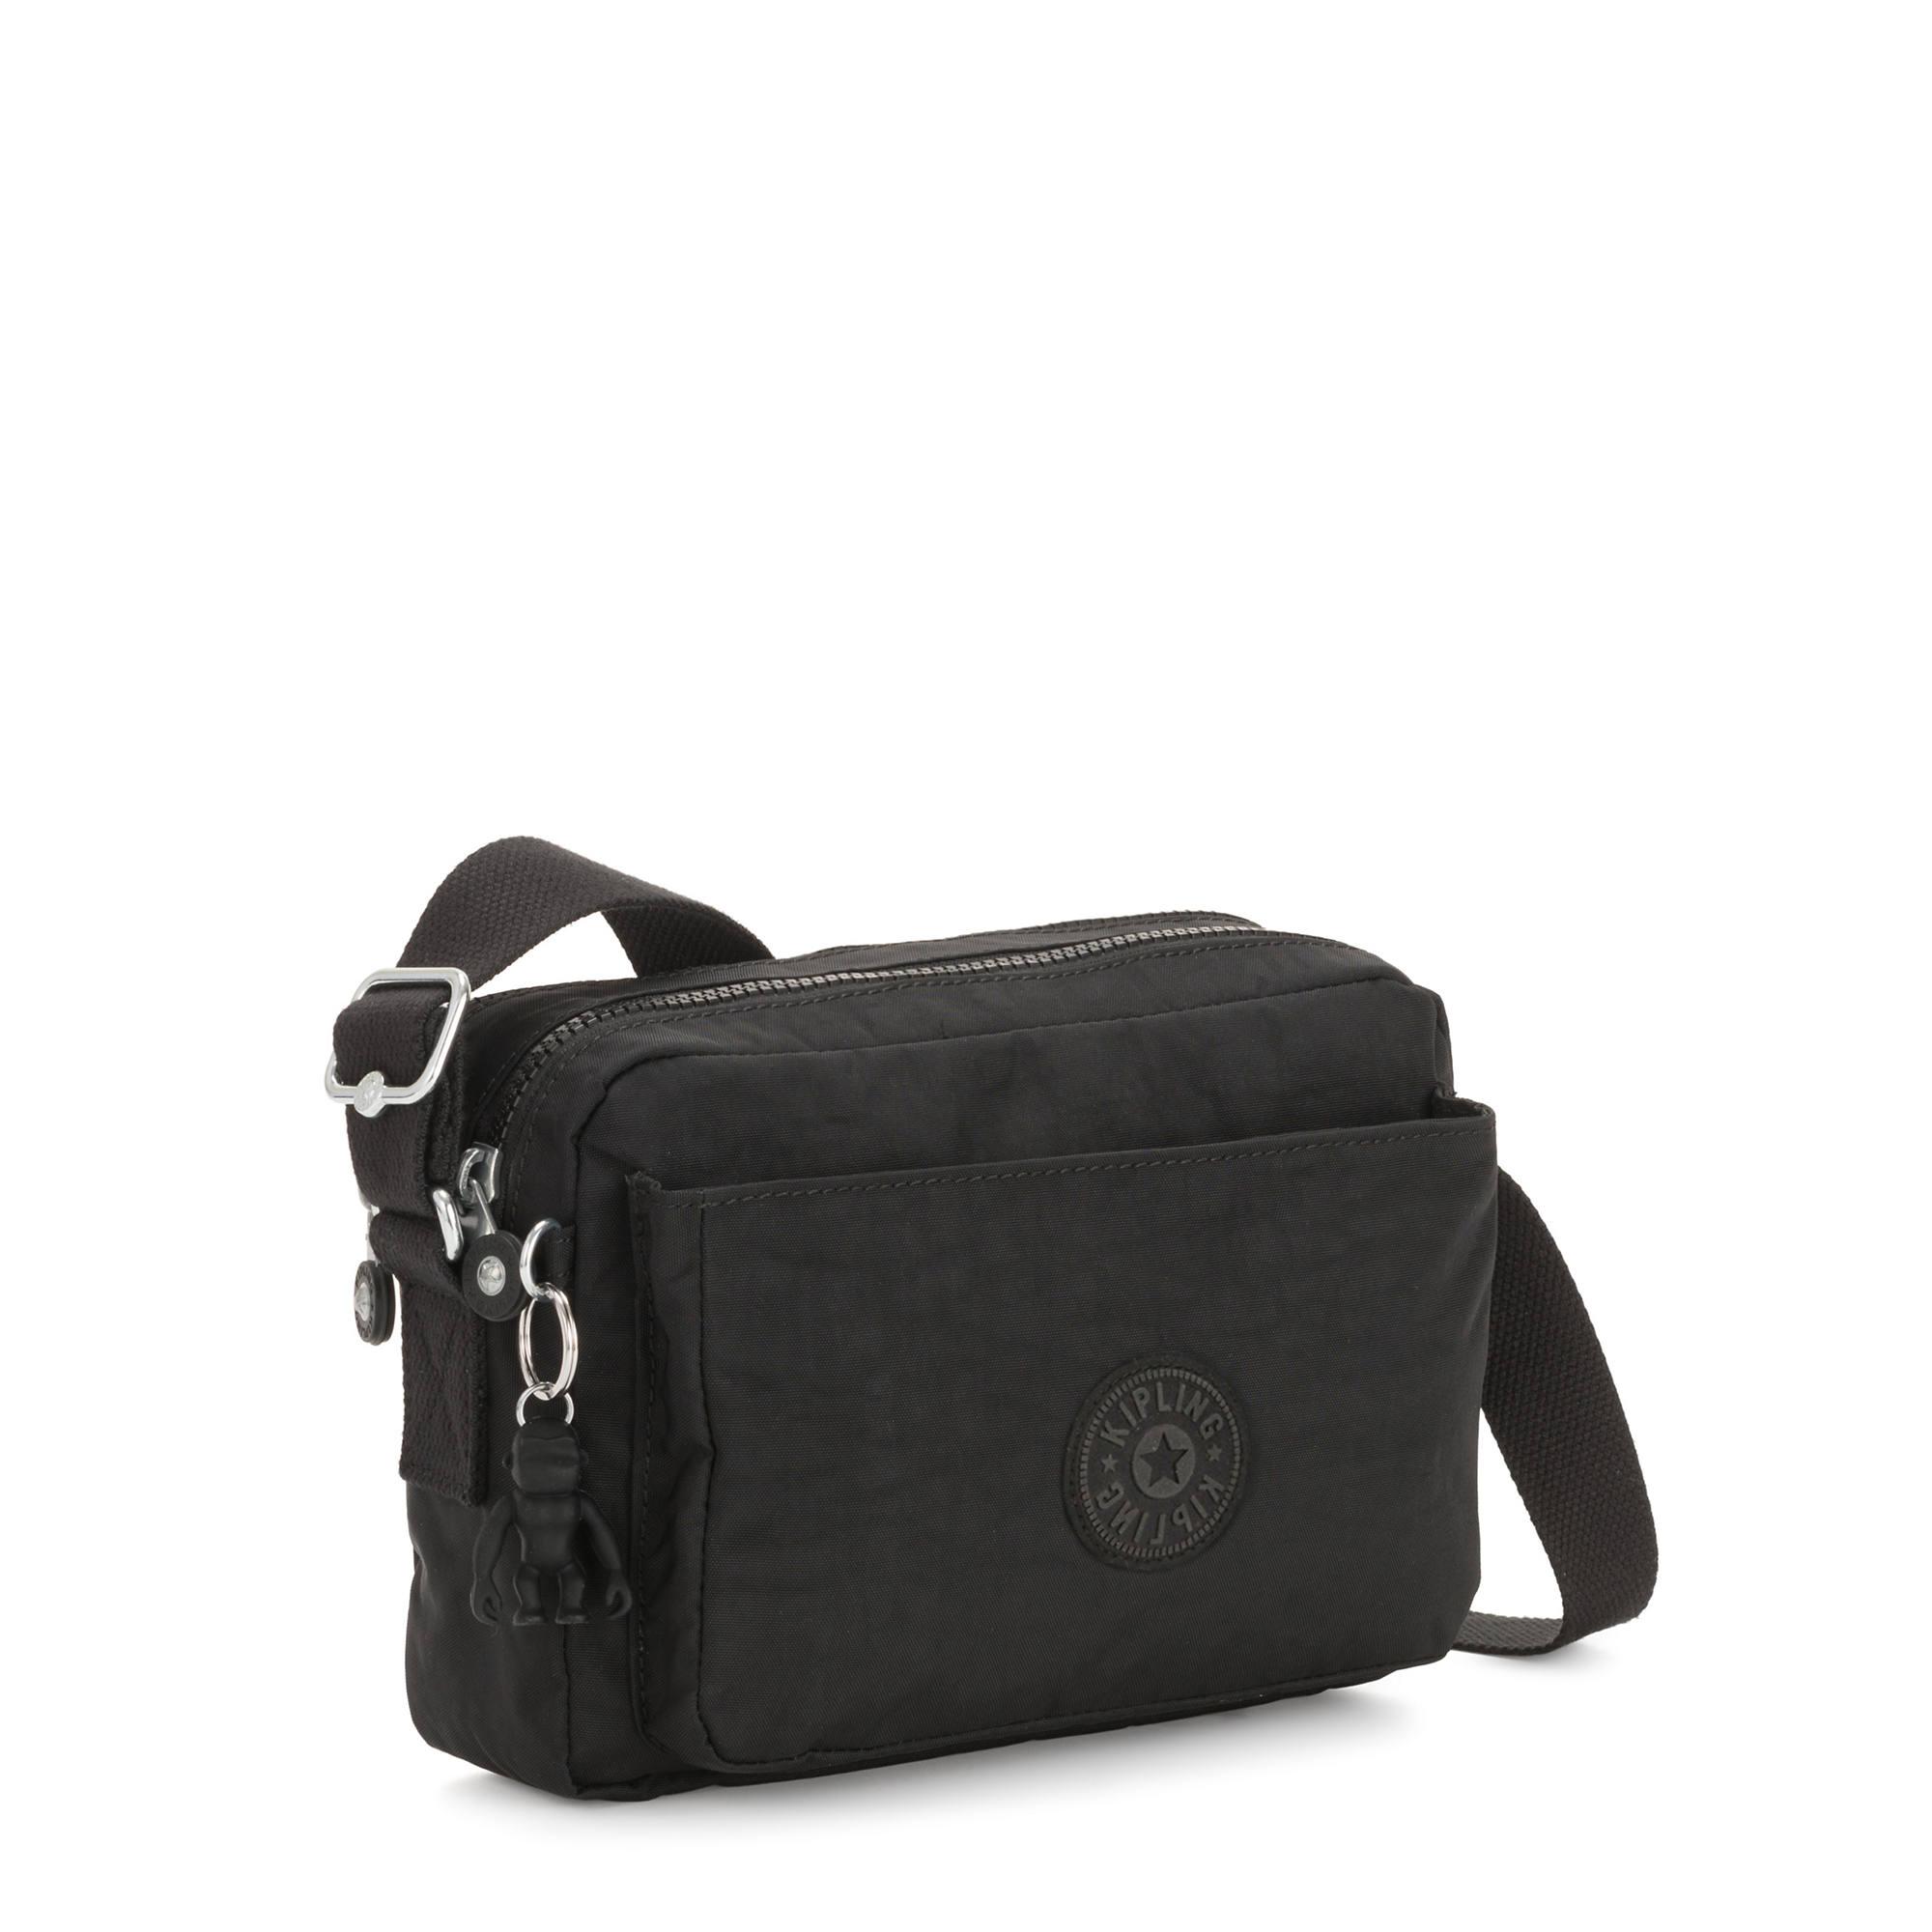 Details about Kipling Abanu Medium Crossbody Bag Black Noir